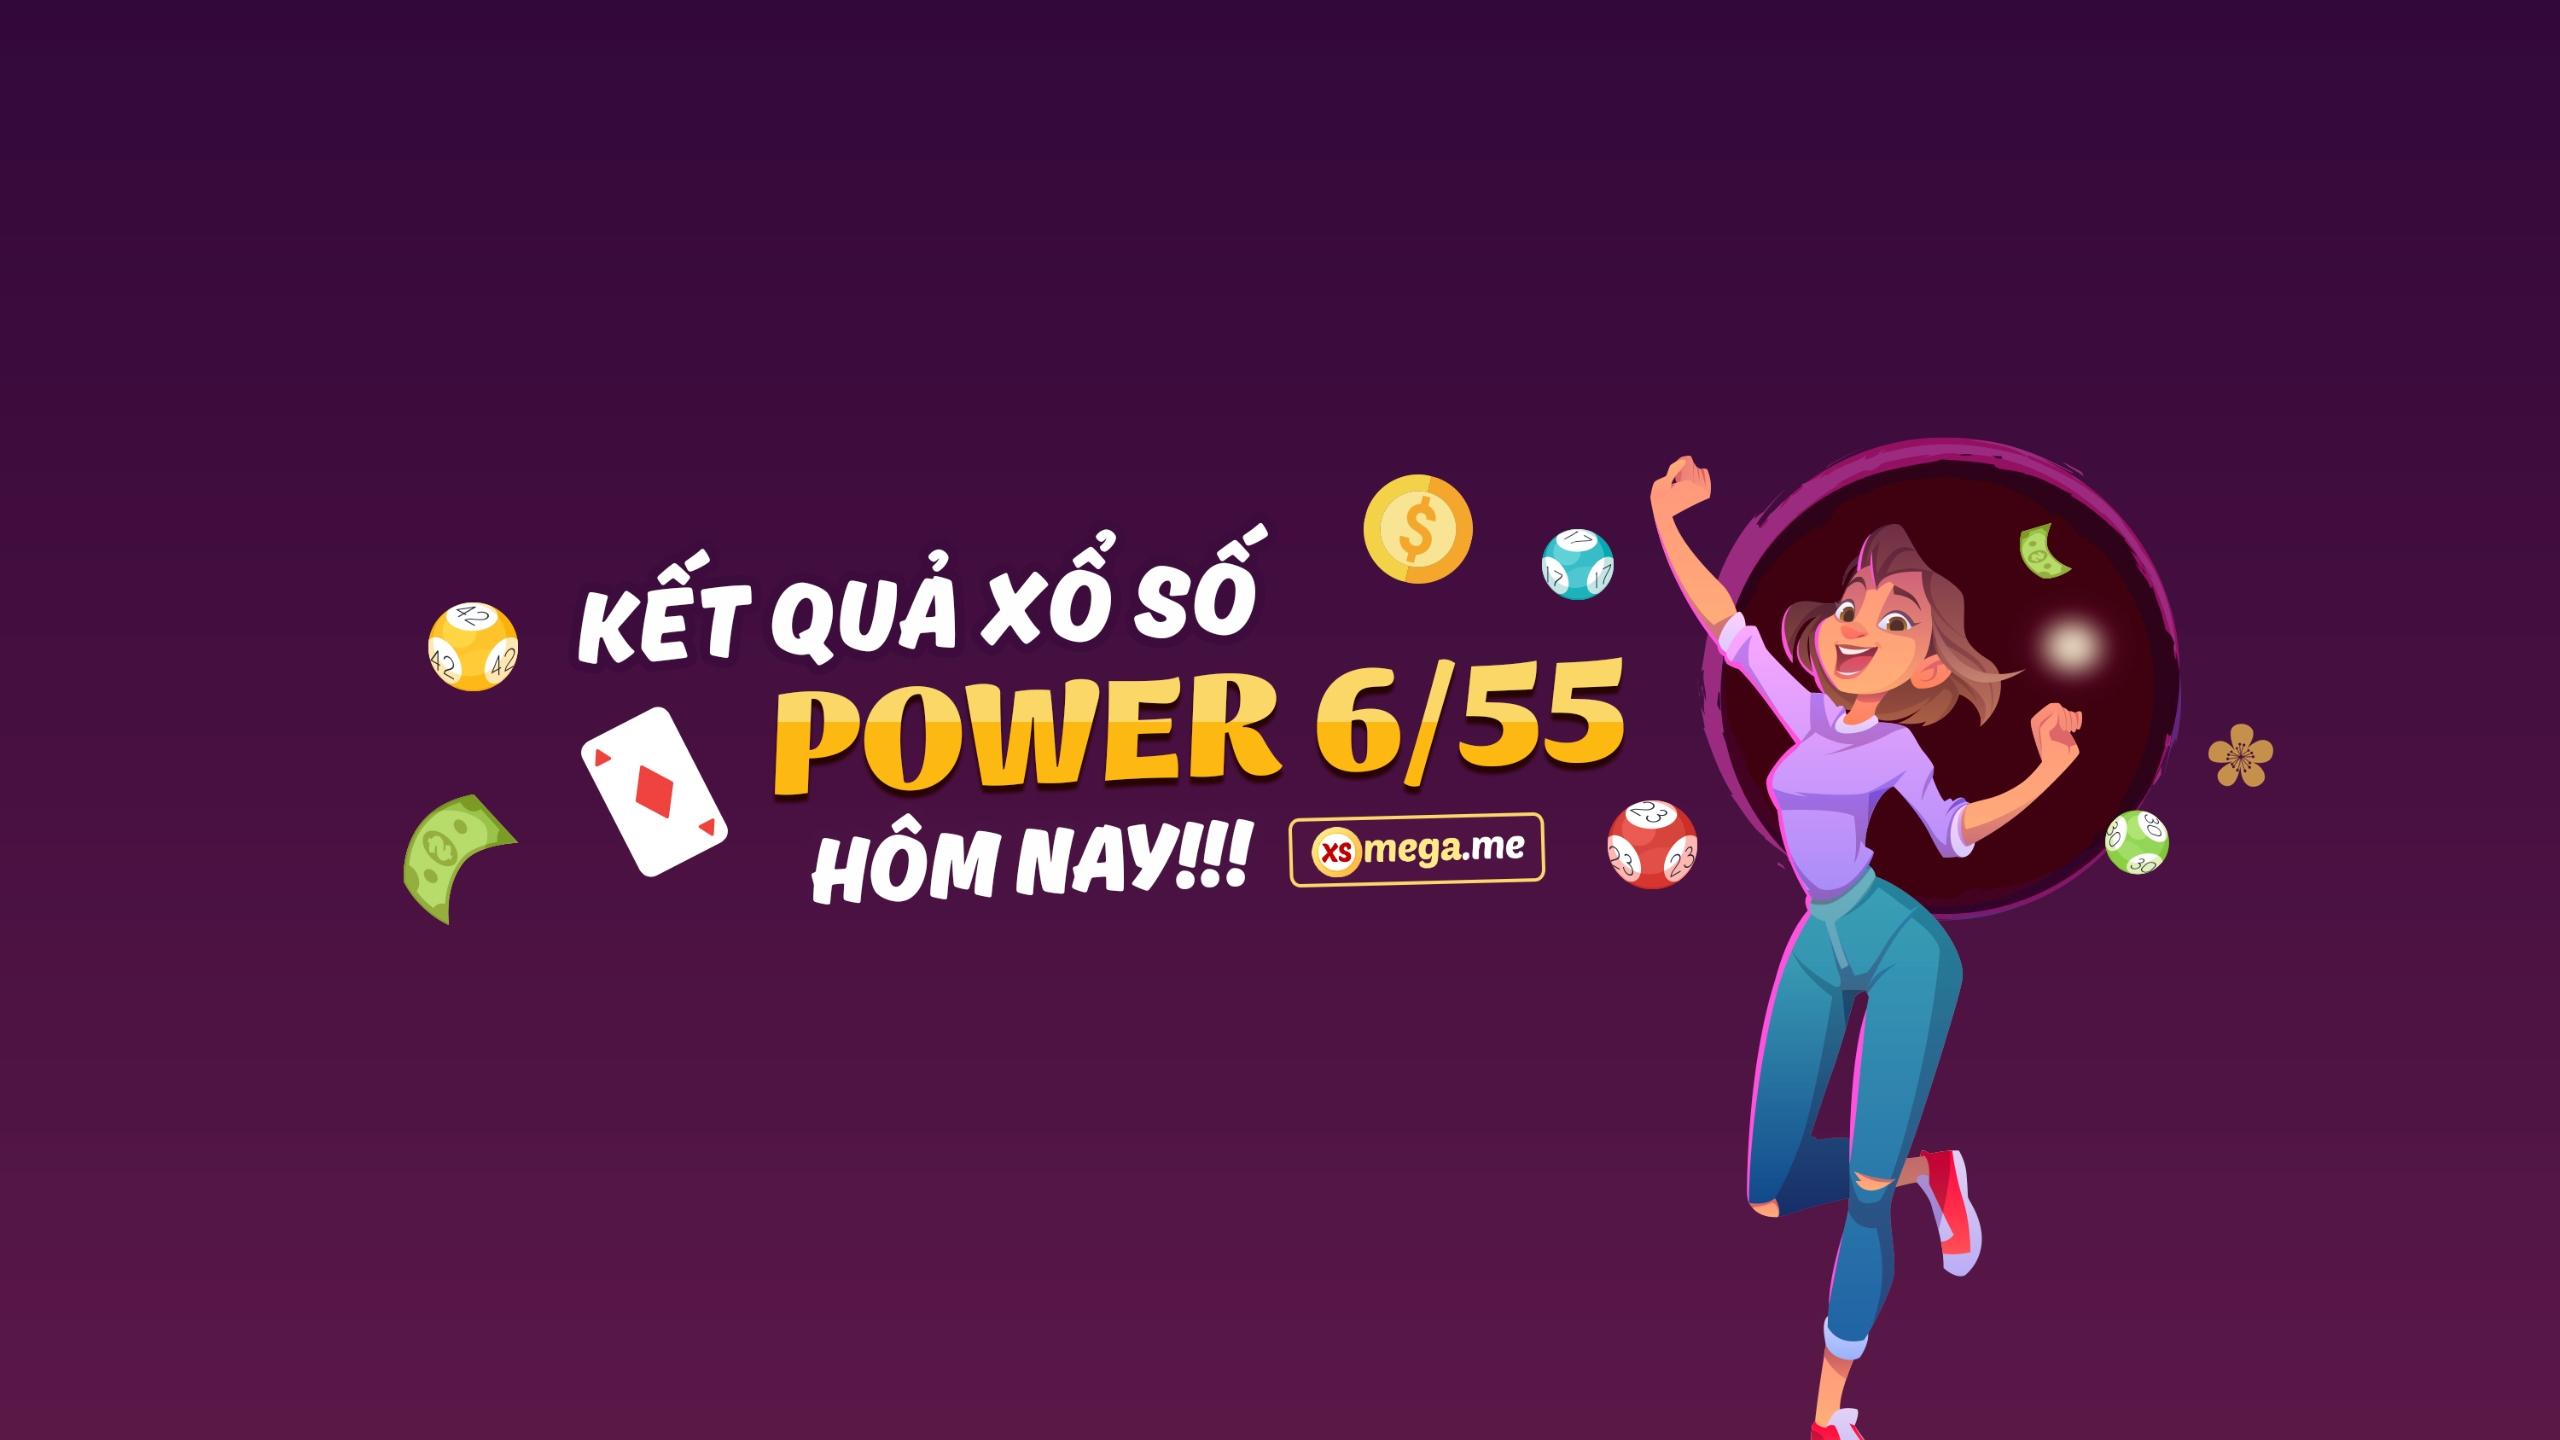 Xổ số 655 - Vietlott 6.55 - Kết quả Vietlott Power (@xspower) Cover Image